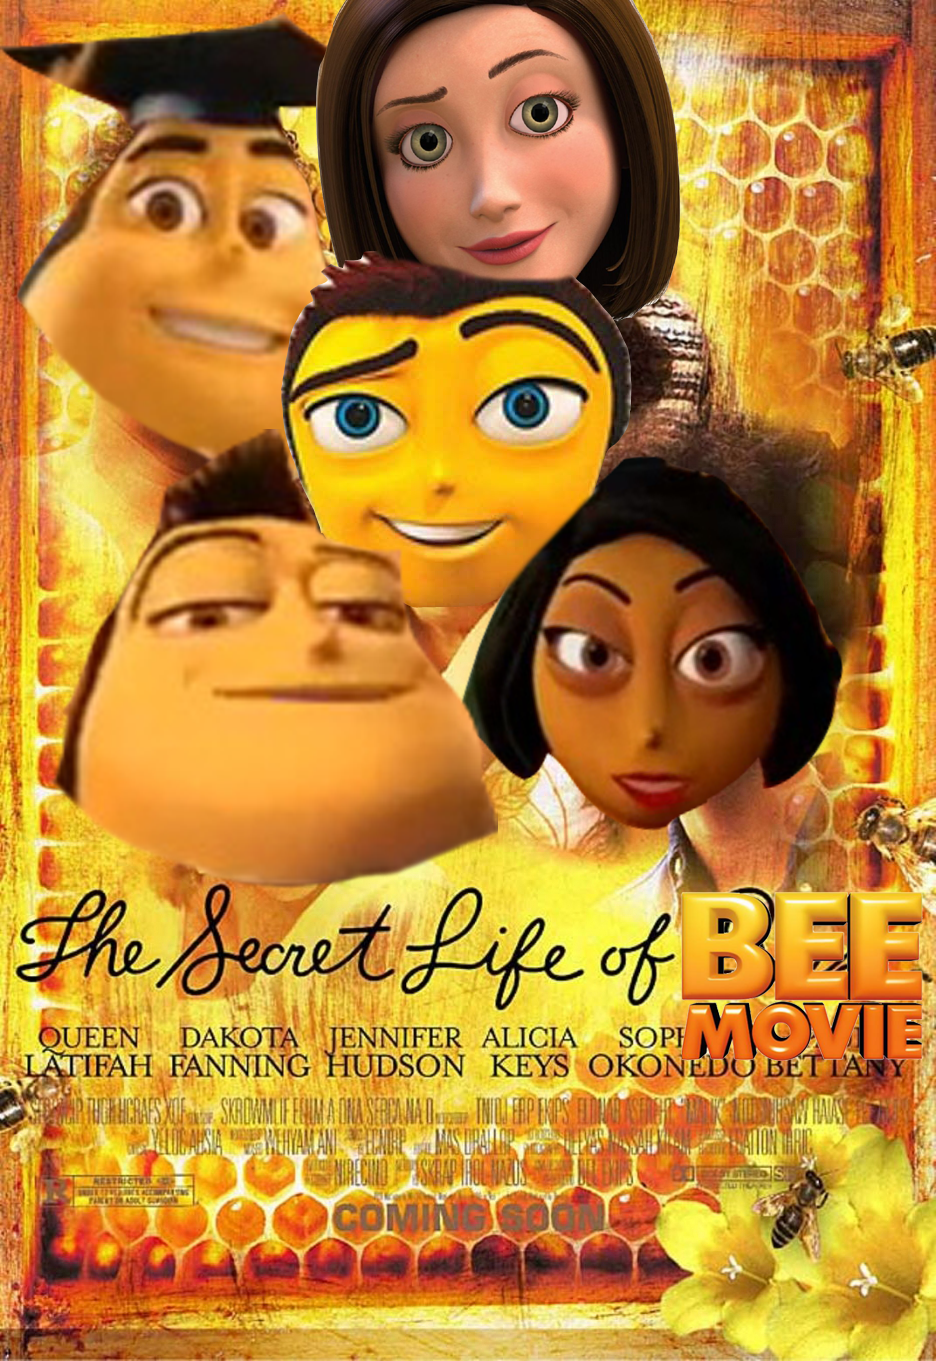 Secreat life of bees movie